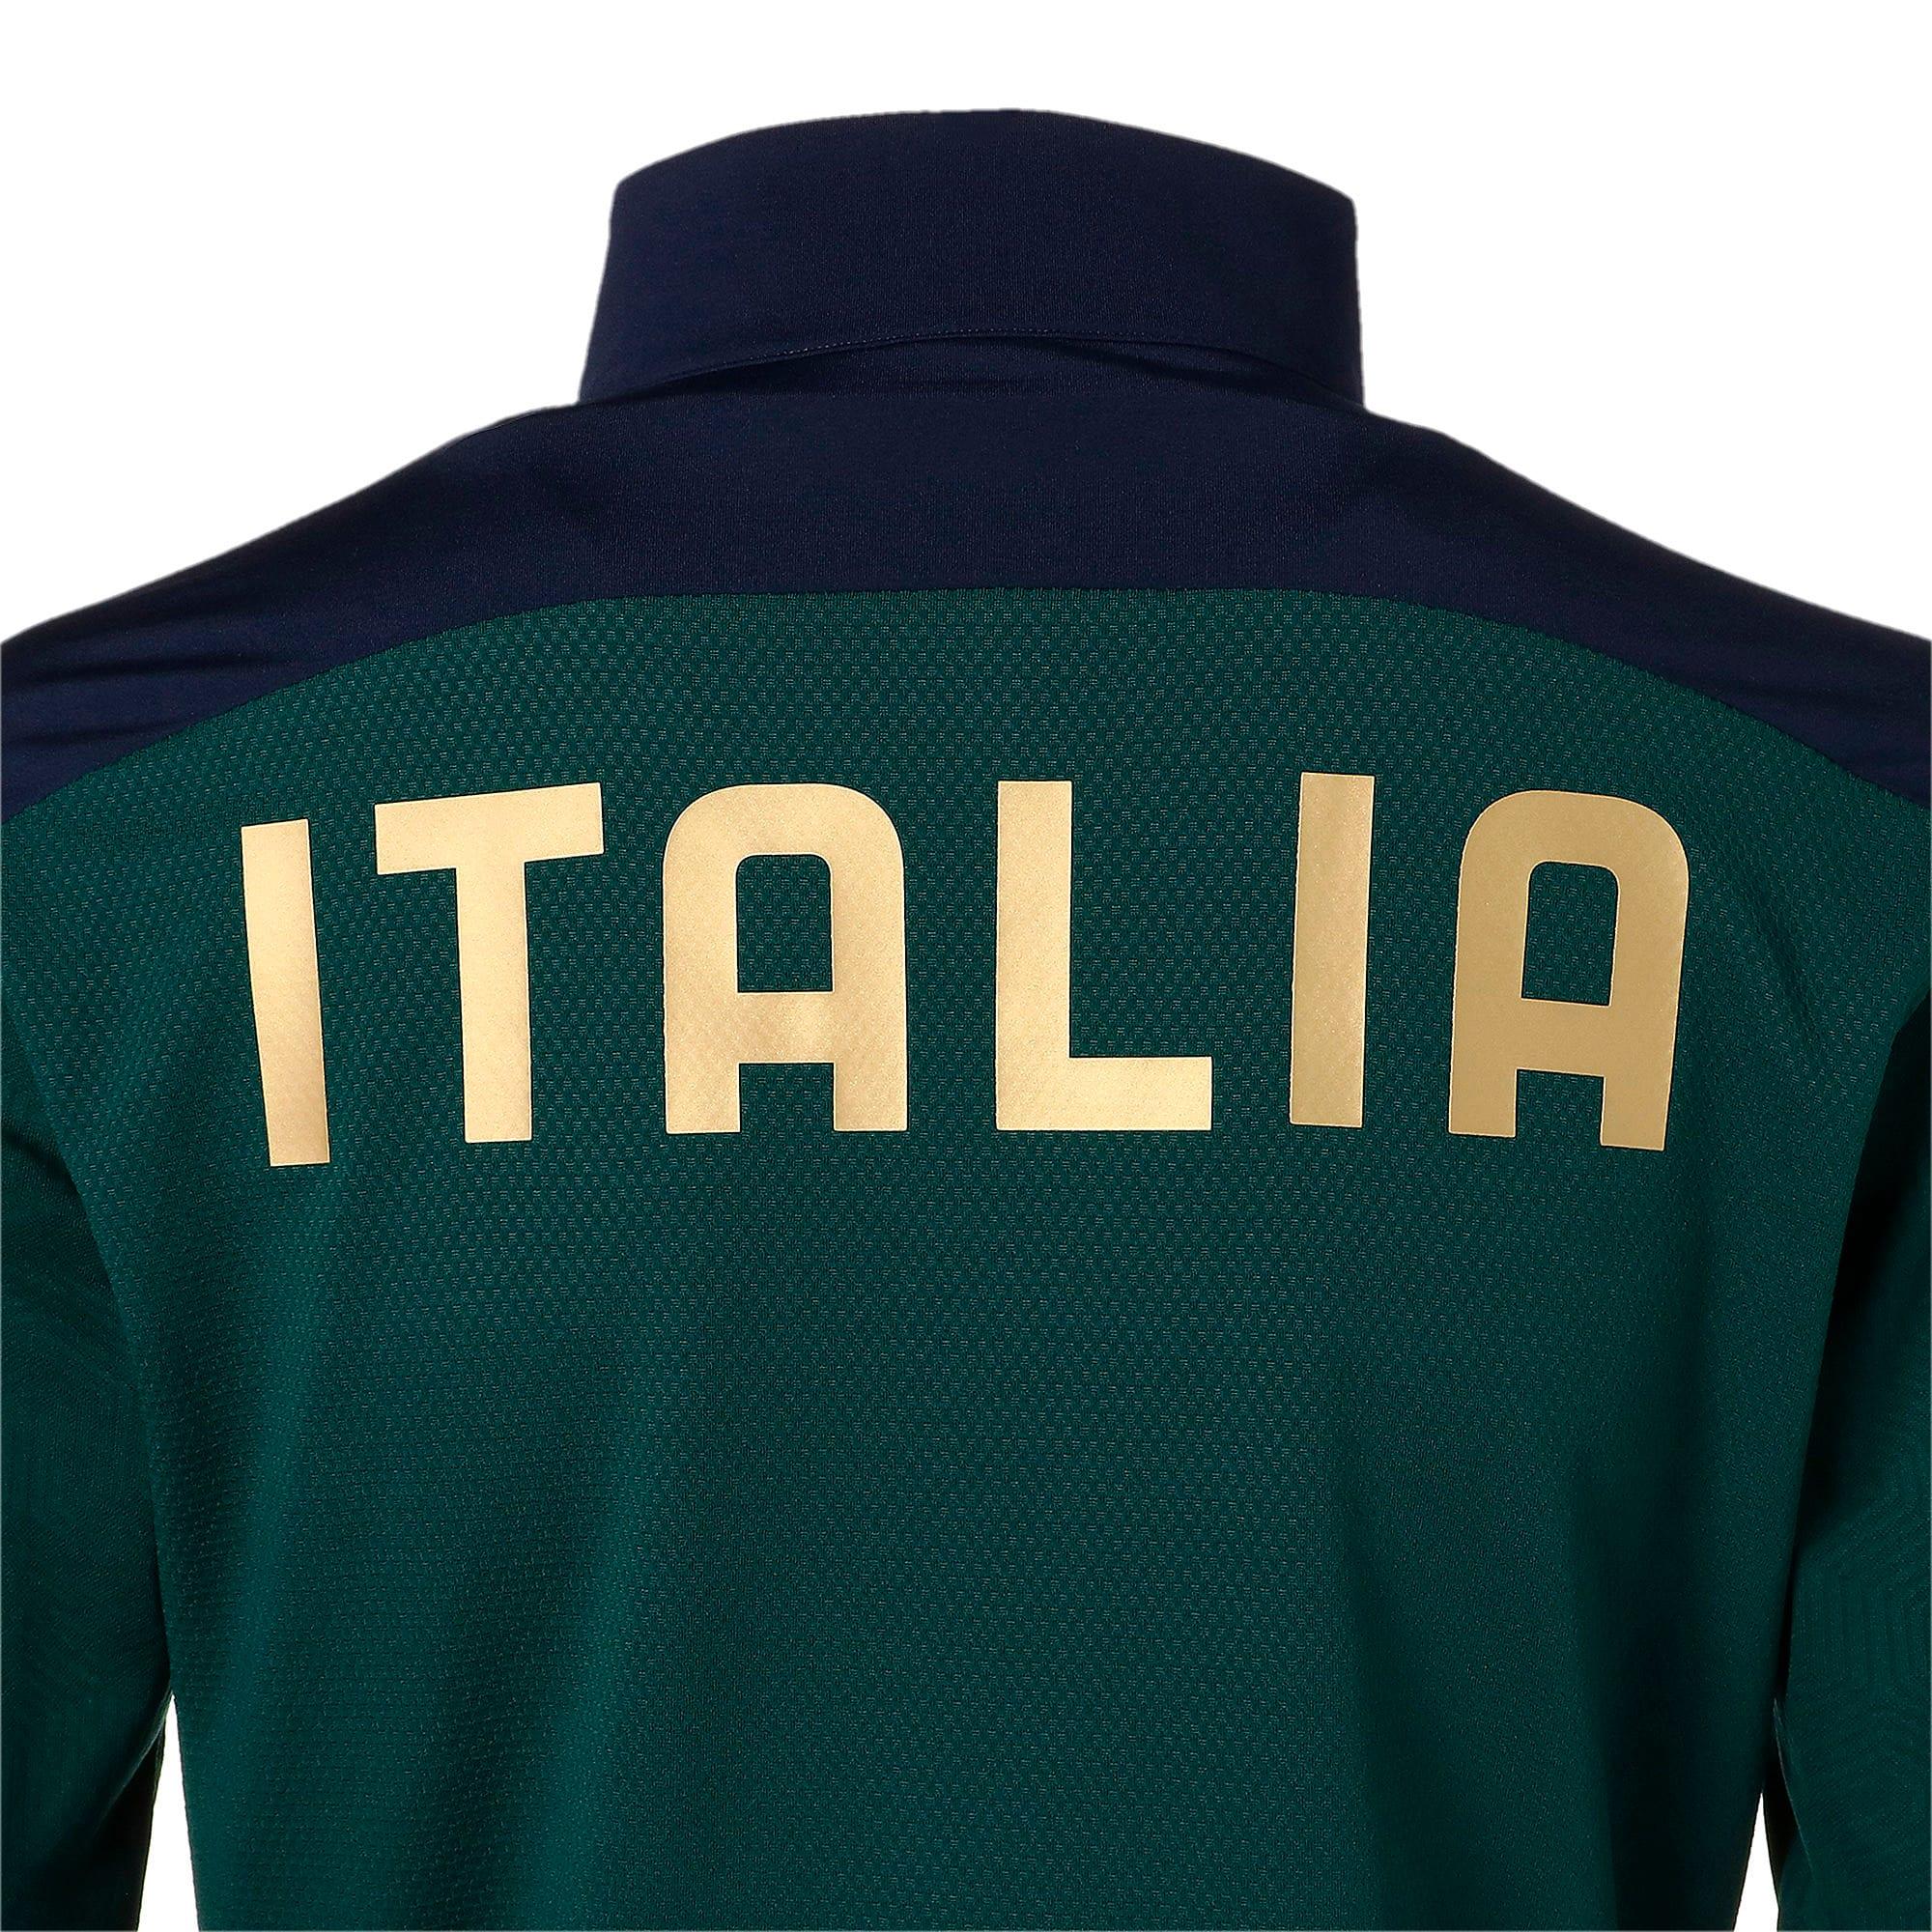 Thumbnail 10 of FIGC イタリア トレーニング 1/4 ジップトップ, Ponderosa Pine-Peacoat, medium-JPN